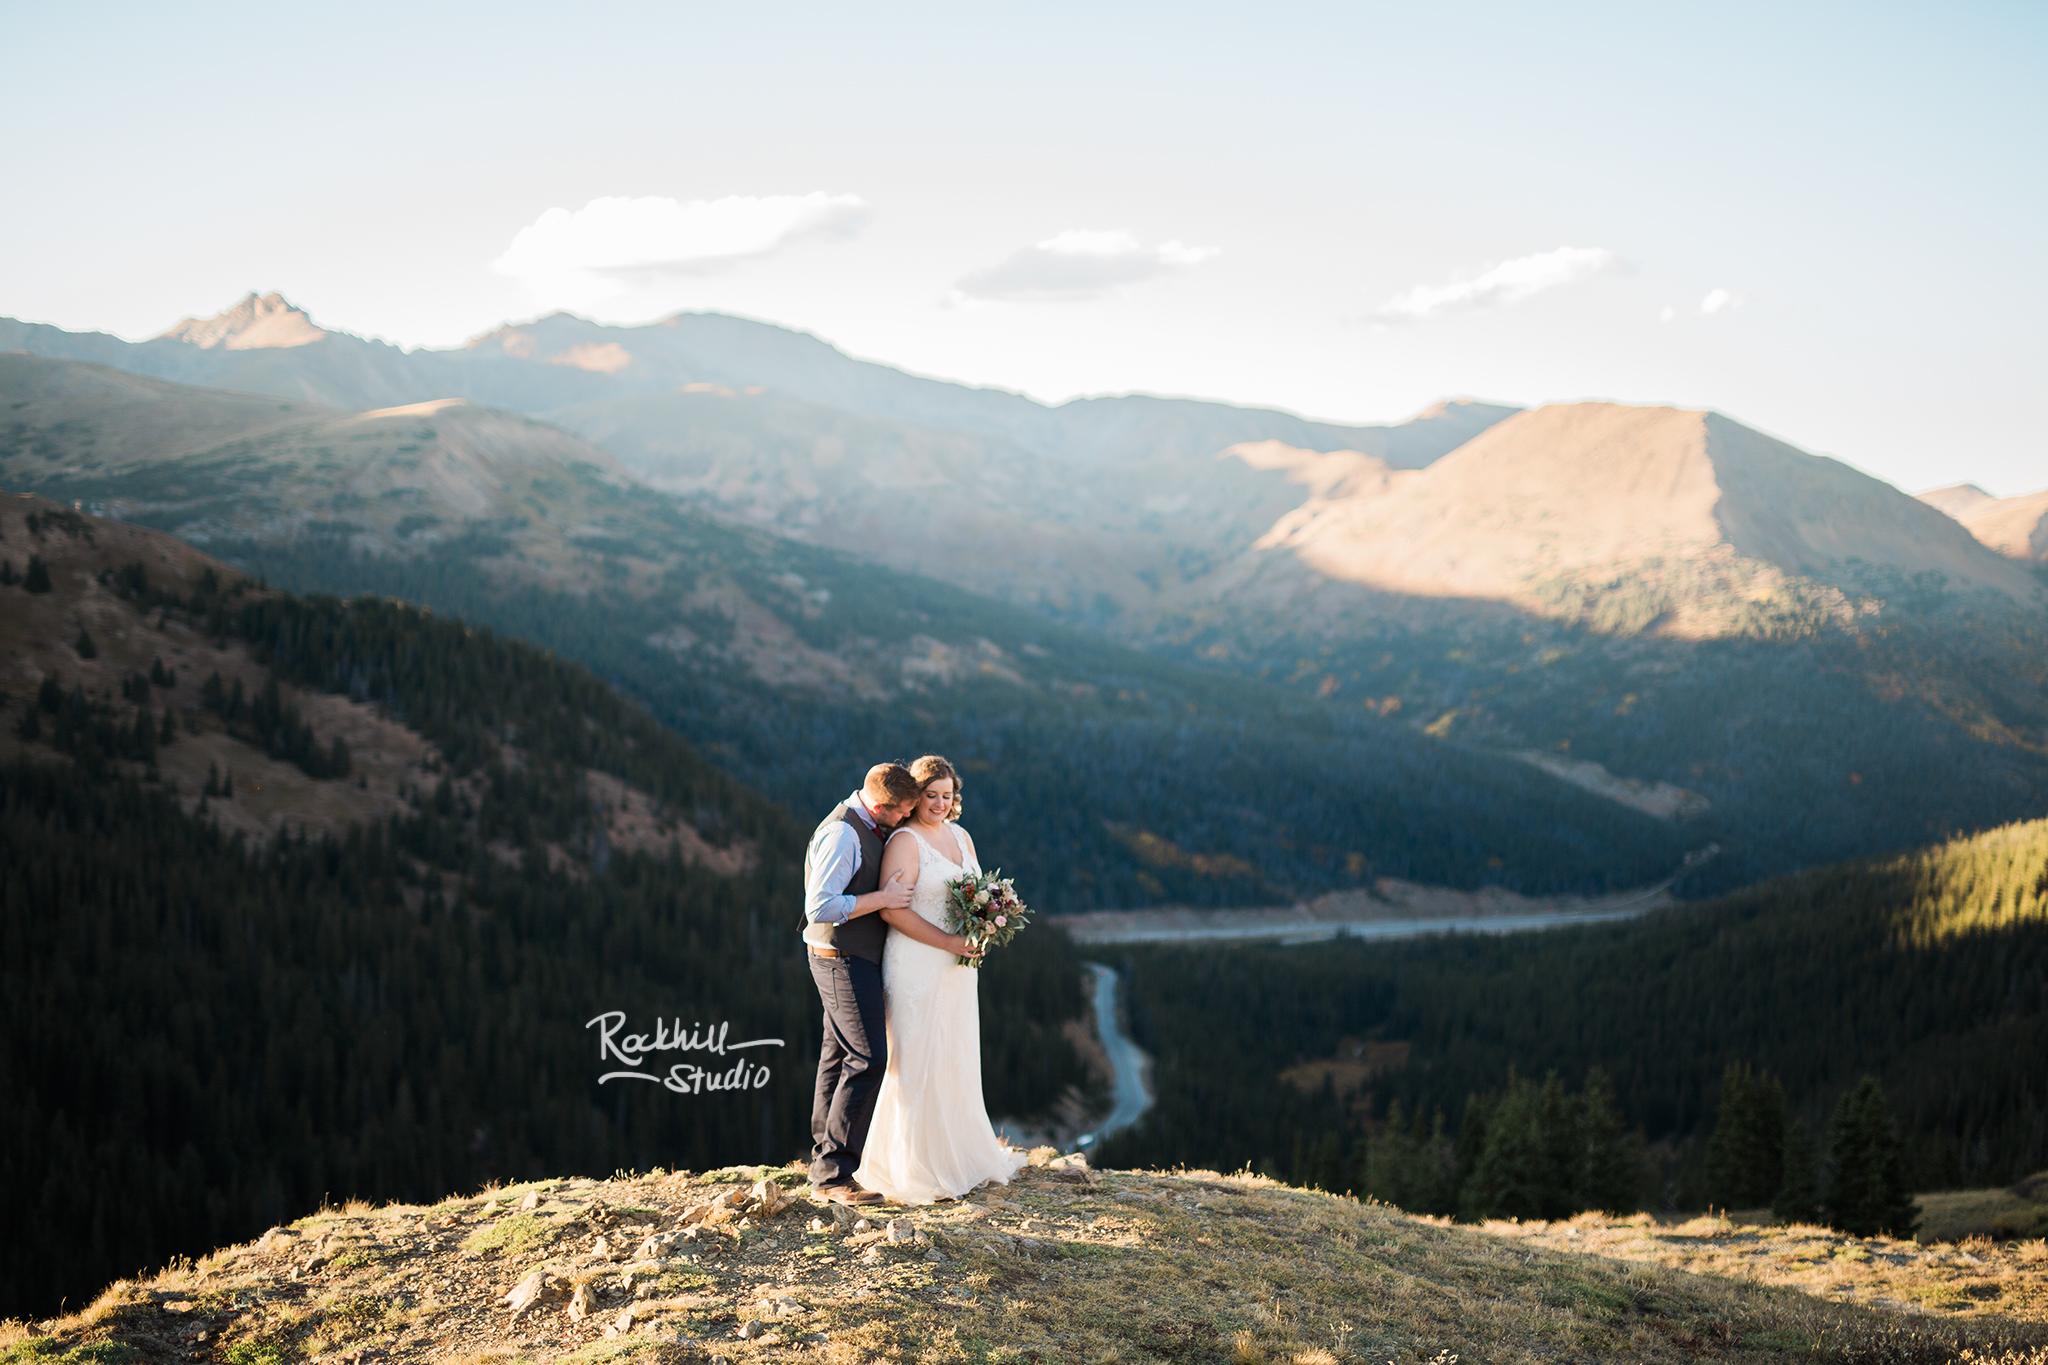 traverse-city-wedding-photography-rockhill-studio-destination-photographer-michigan-2.jpg